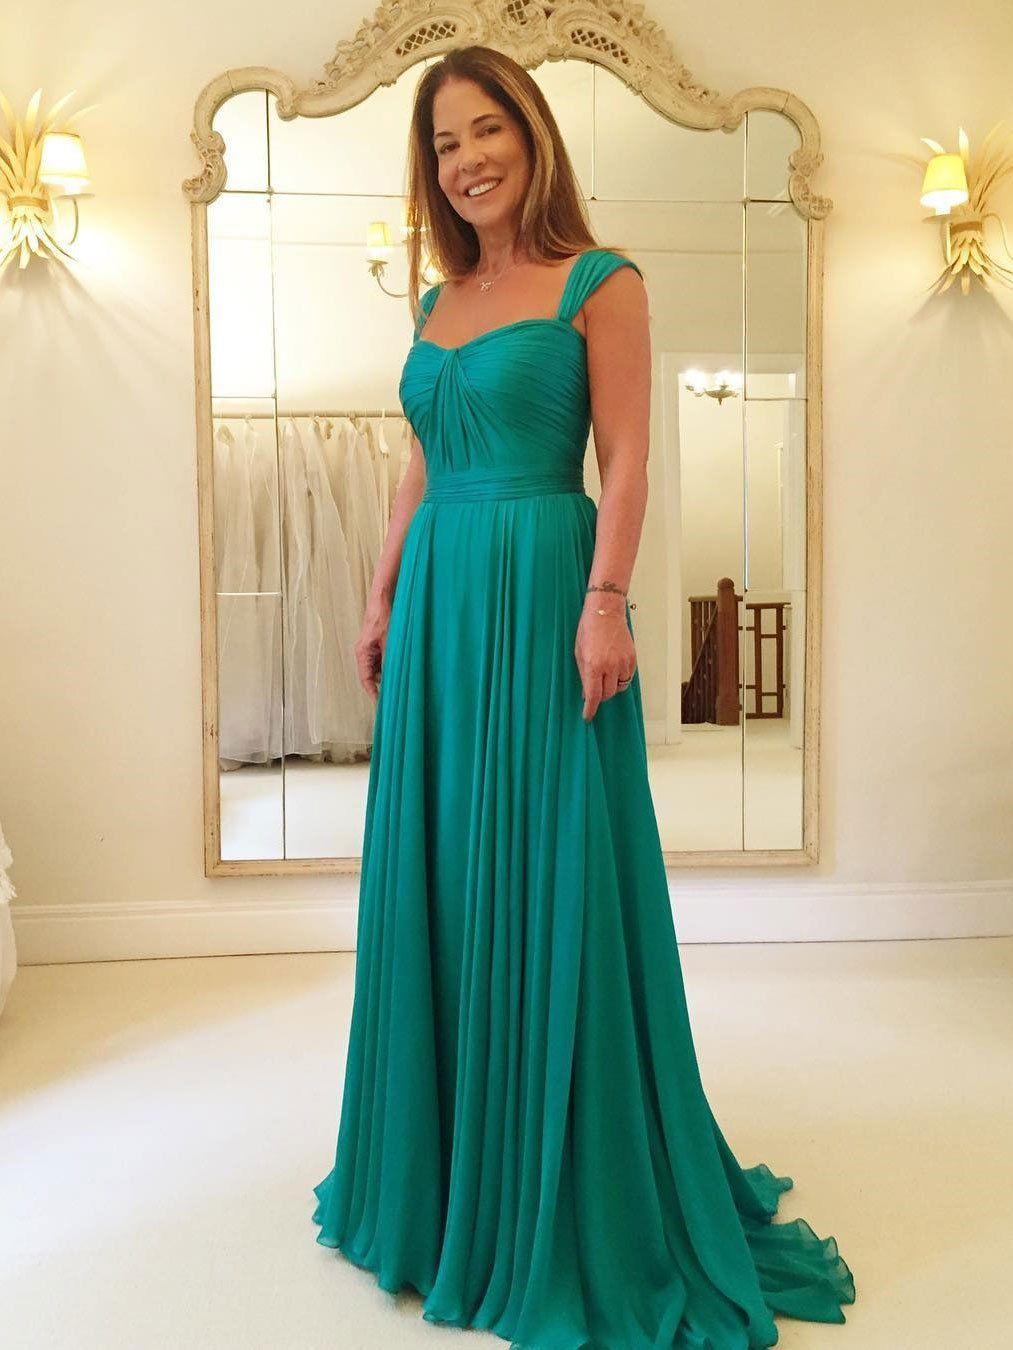 Long Chiffon Bridesmaid Dresses,Cheap Party Dresses for Bridesmaid ...